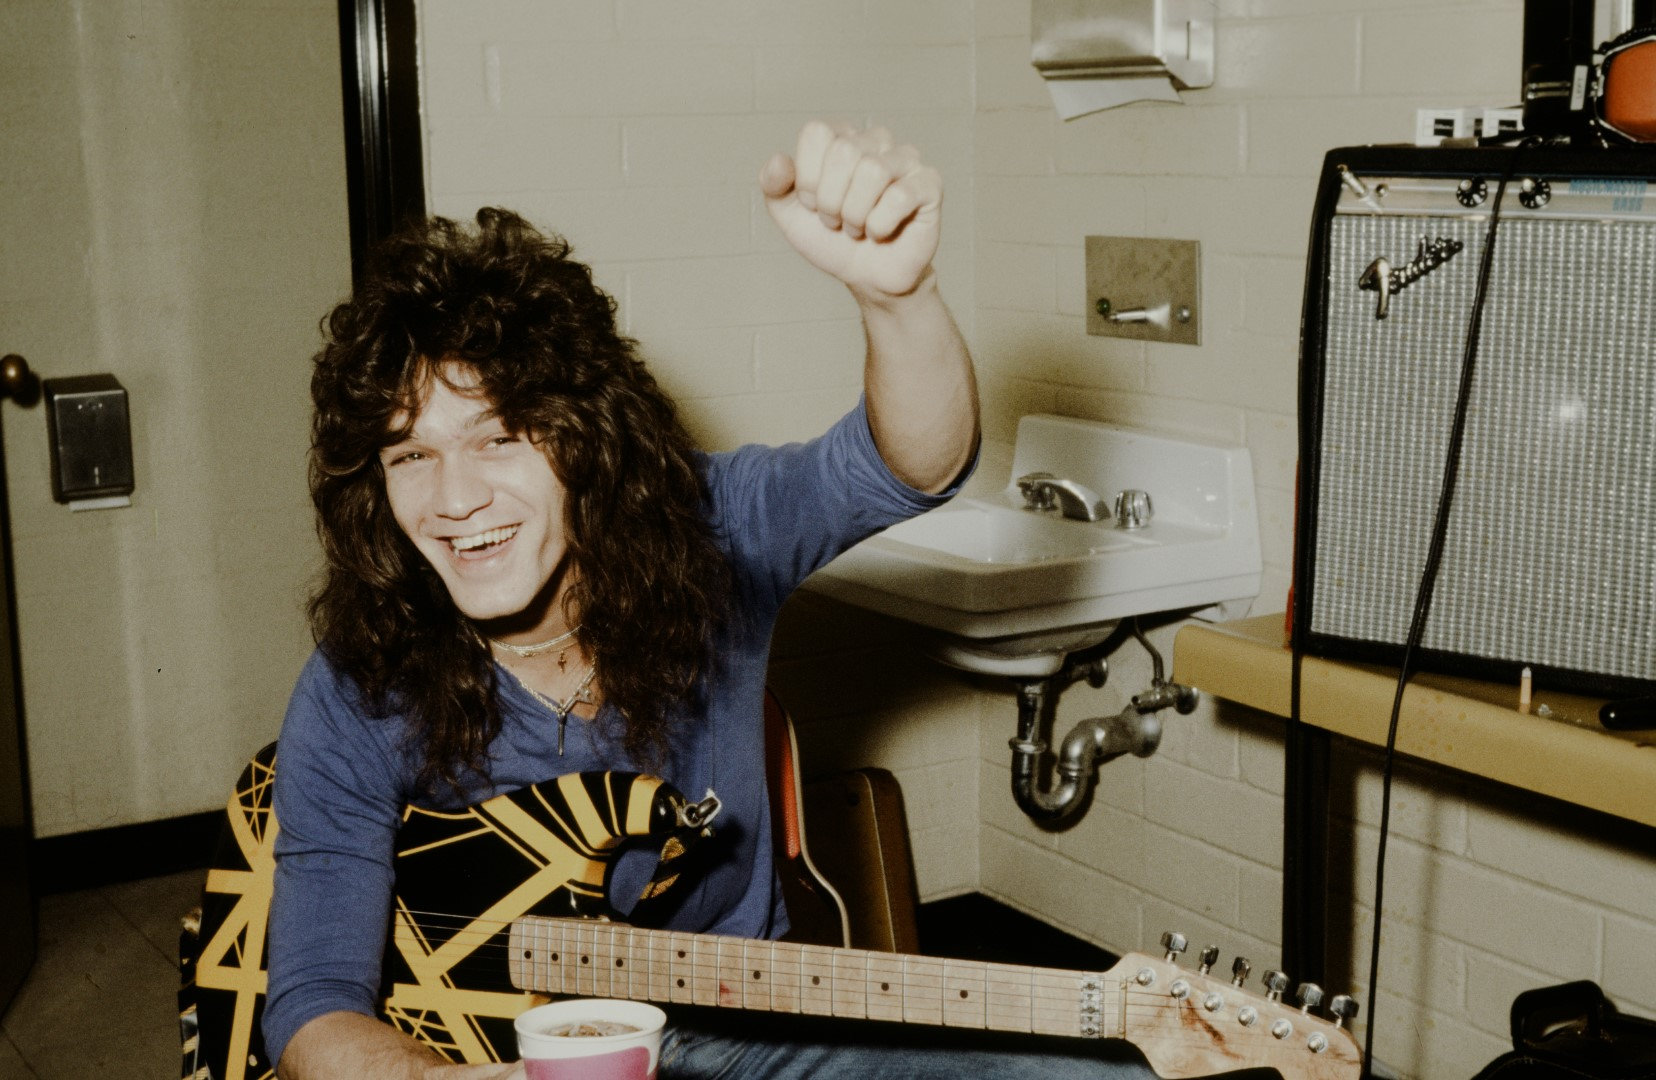 Eddie Van Halen Backstage